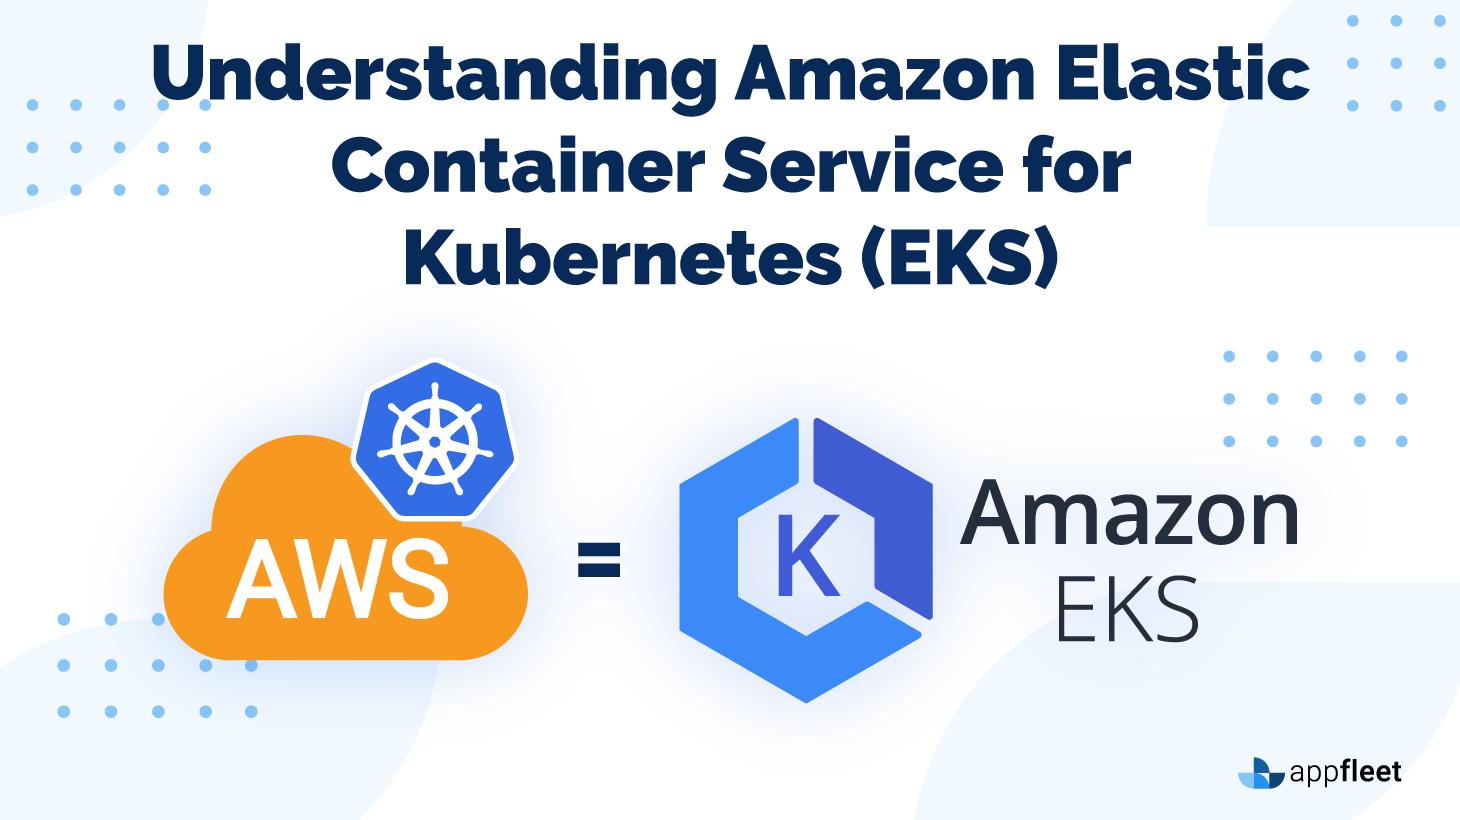 Understanding Amazon Elastic Container Service for Kubernetes (EKS)